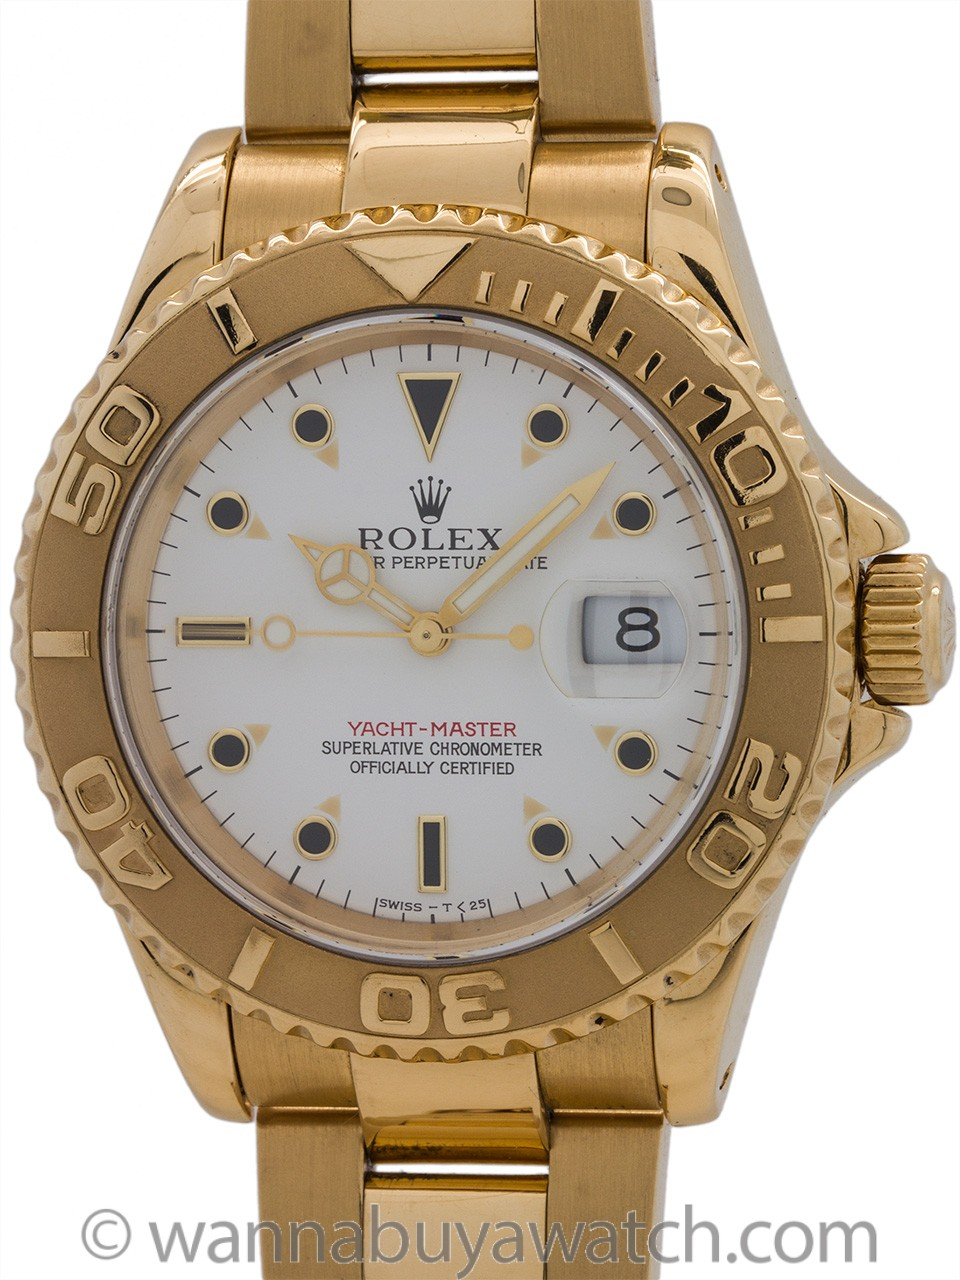 Rolex Man's Yachtmaster 18K YG ref 16628 circa 1990's